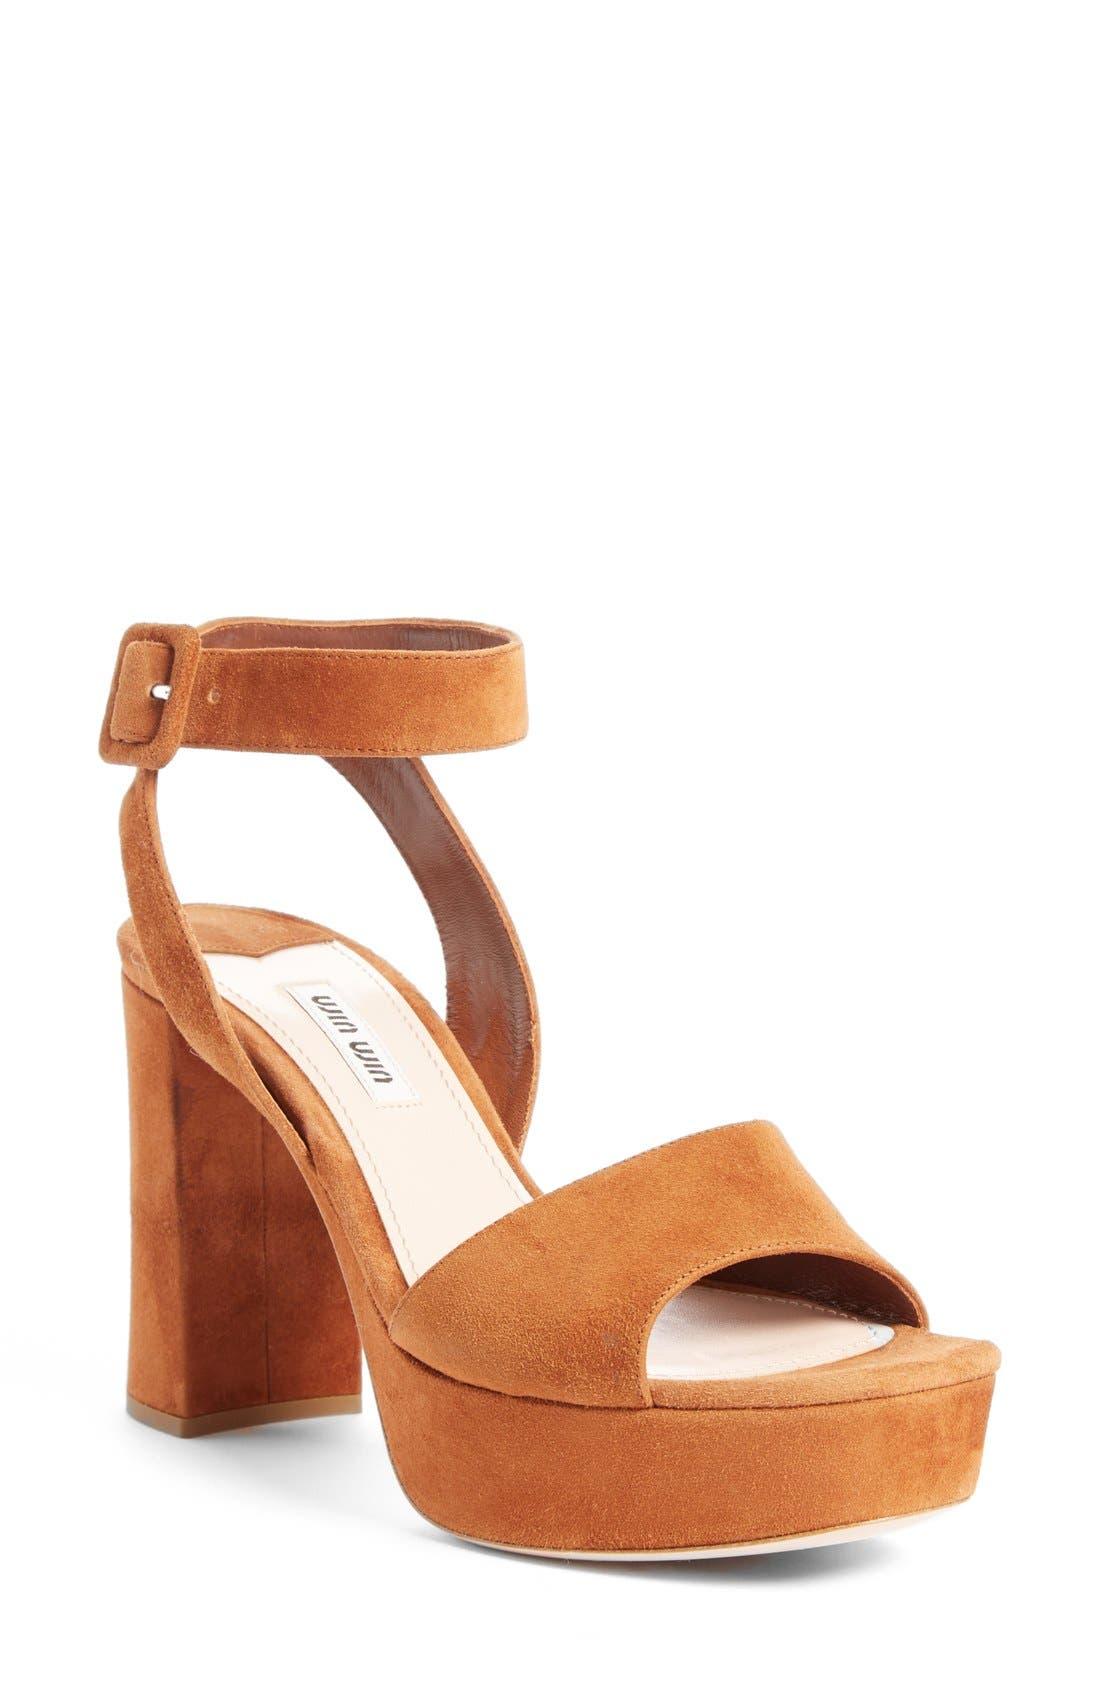 MIU MIU 'Sandali' Ankle Strap Sandal, Main, color, 200